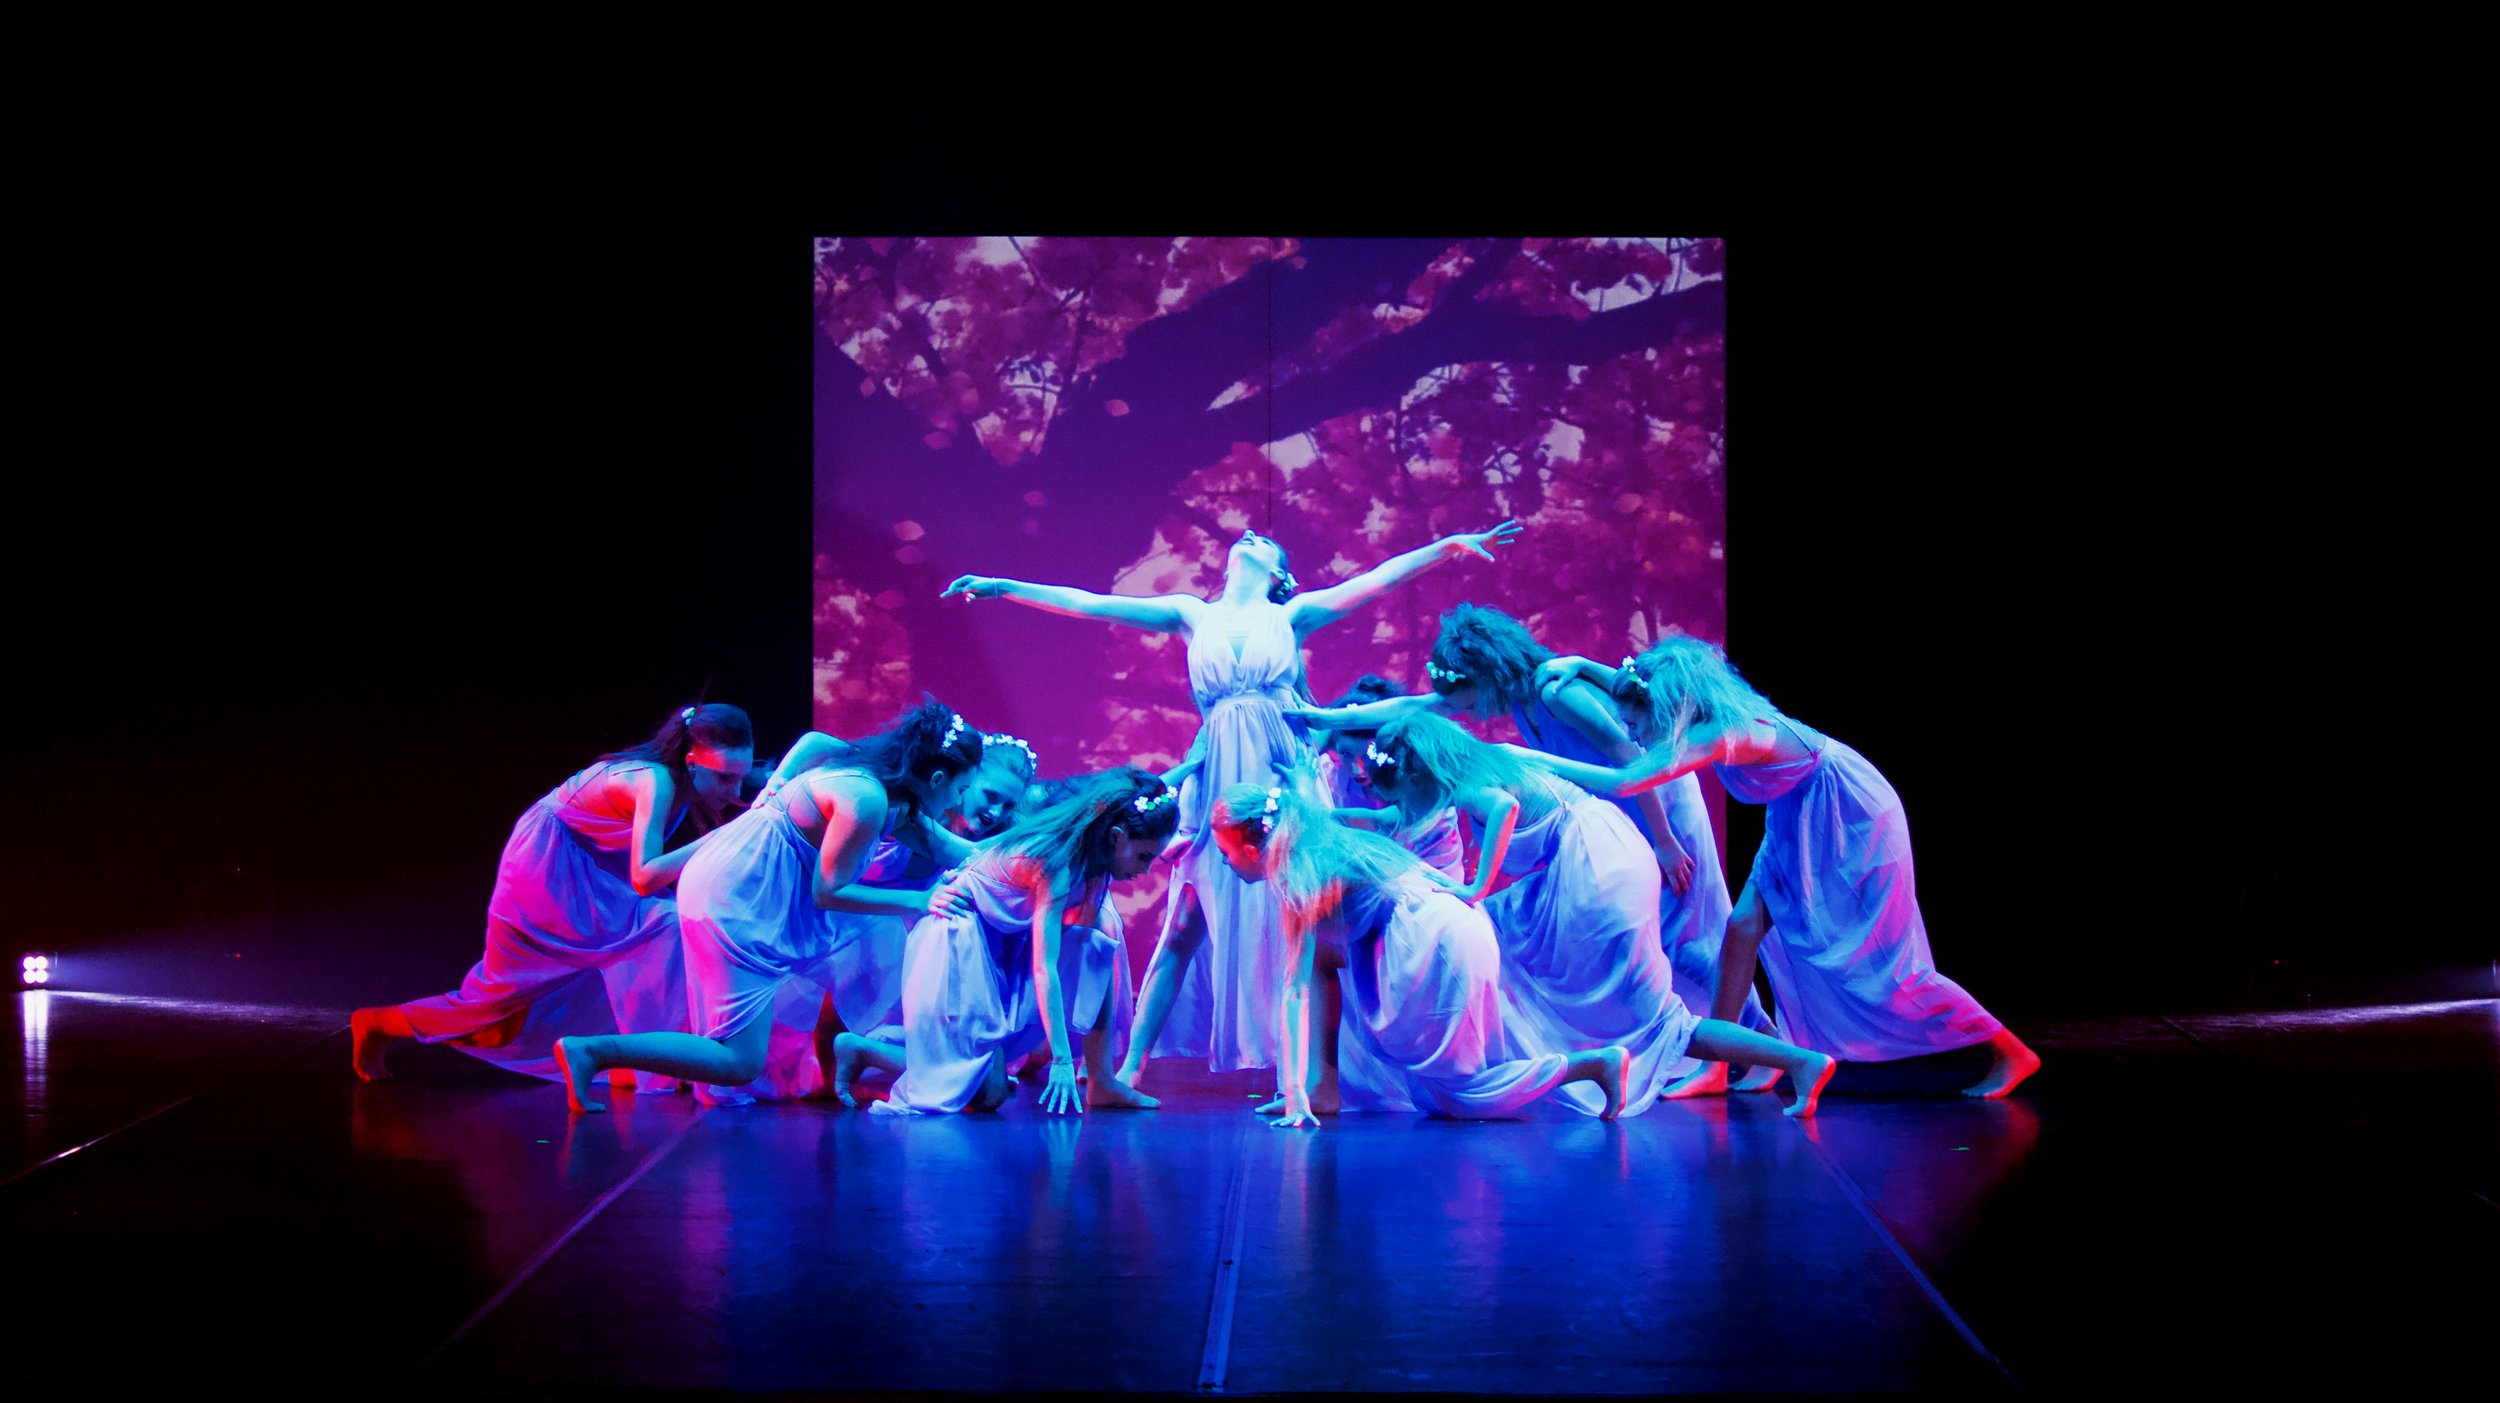 pensieri sentimenti movimenti danza - jAZZ DANCE, HIP HOP, VIDEO DANCE, VIDEO DANCE SUI TACCHI, DANZA CLASSICA, BROADWAY DANCE, LYRICAL JAZZ, PRE DANCE, JAZZ TECNICO A PARTIRE DAI 4 ANNIdiretta da Ilaria eccher e carlos julio madera